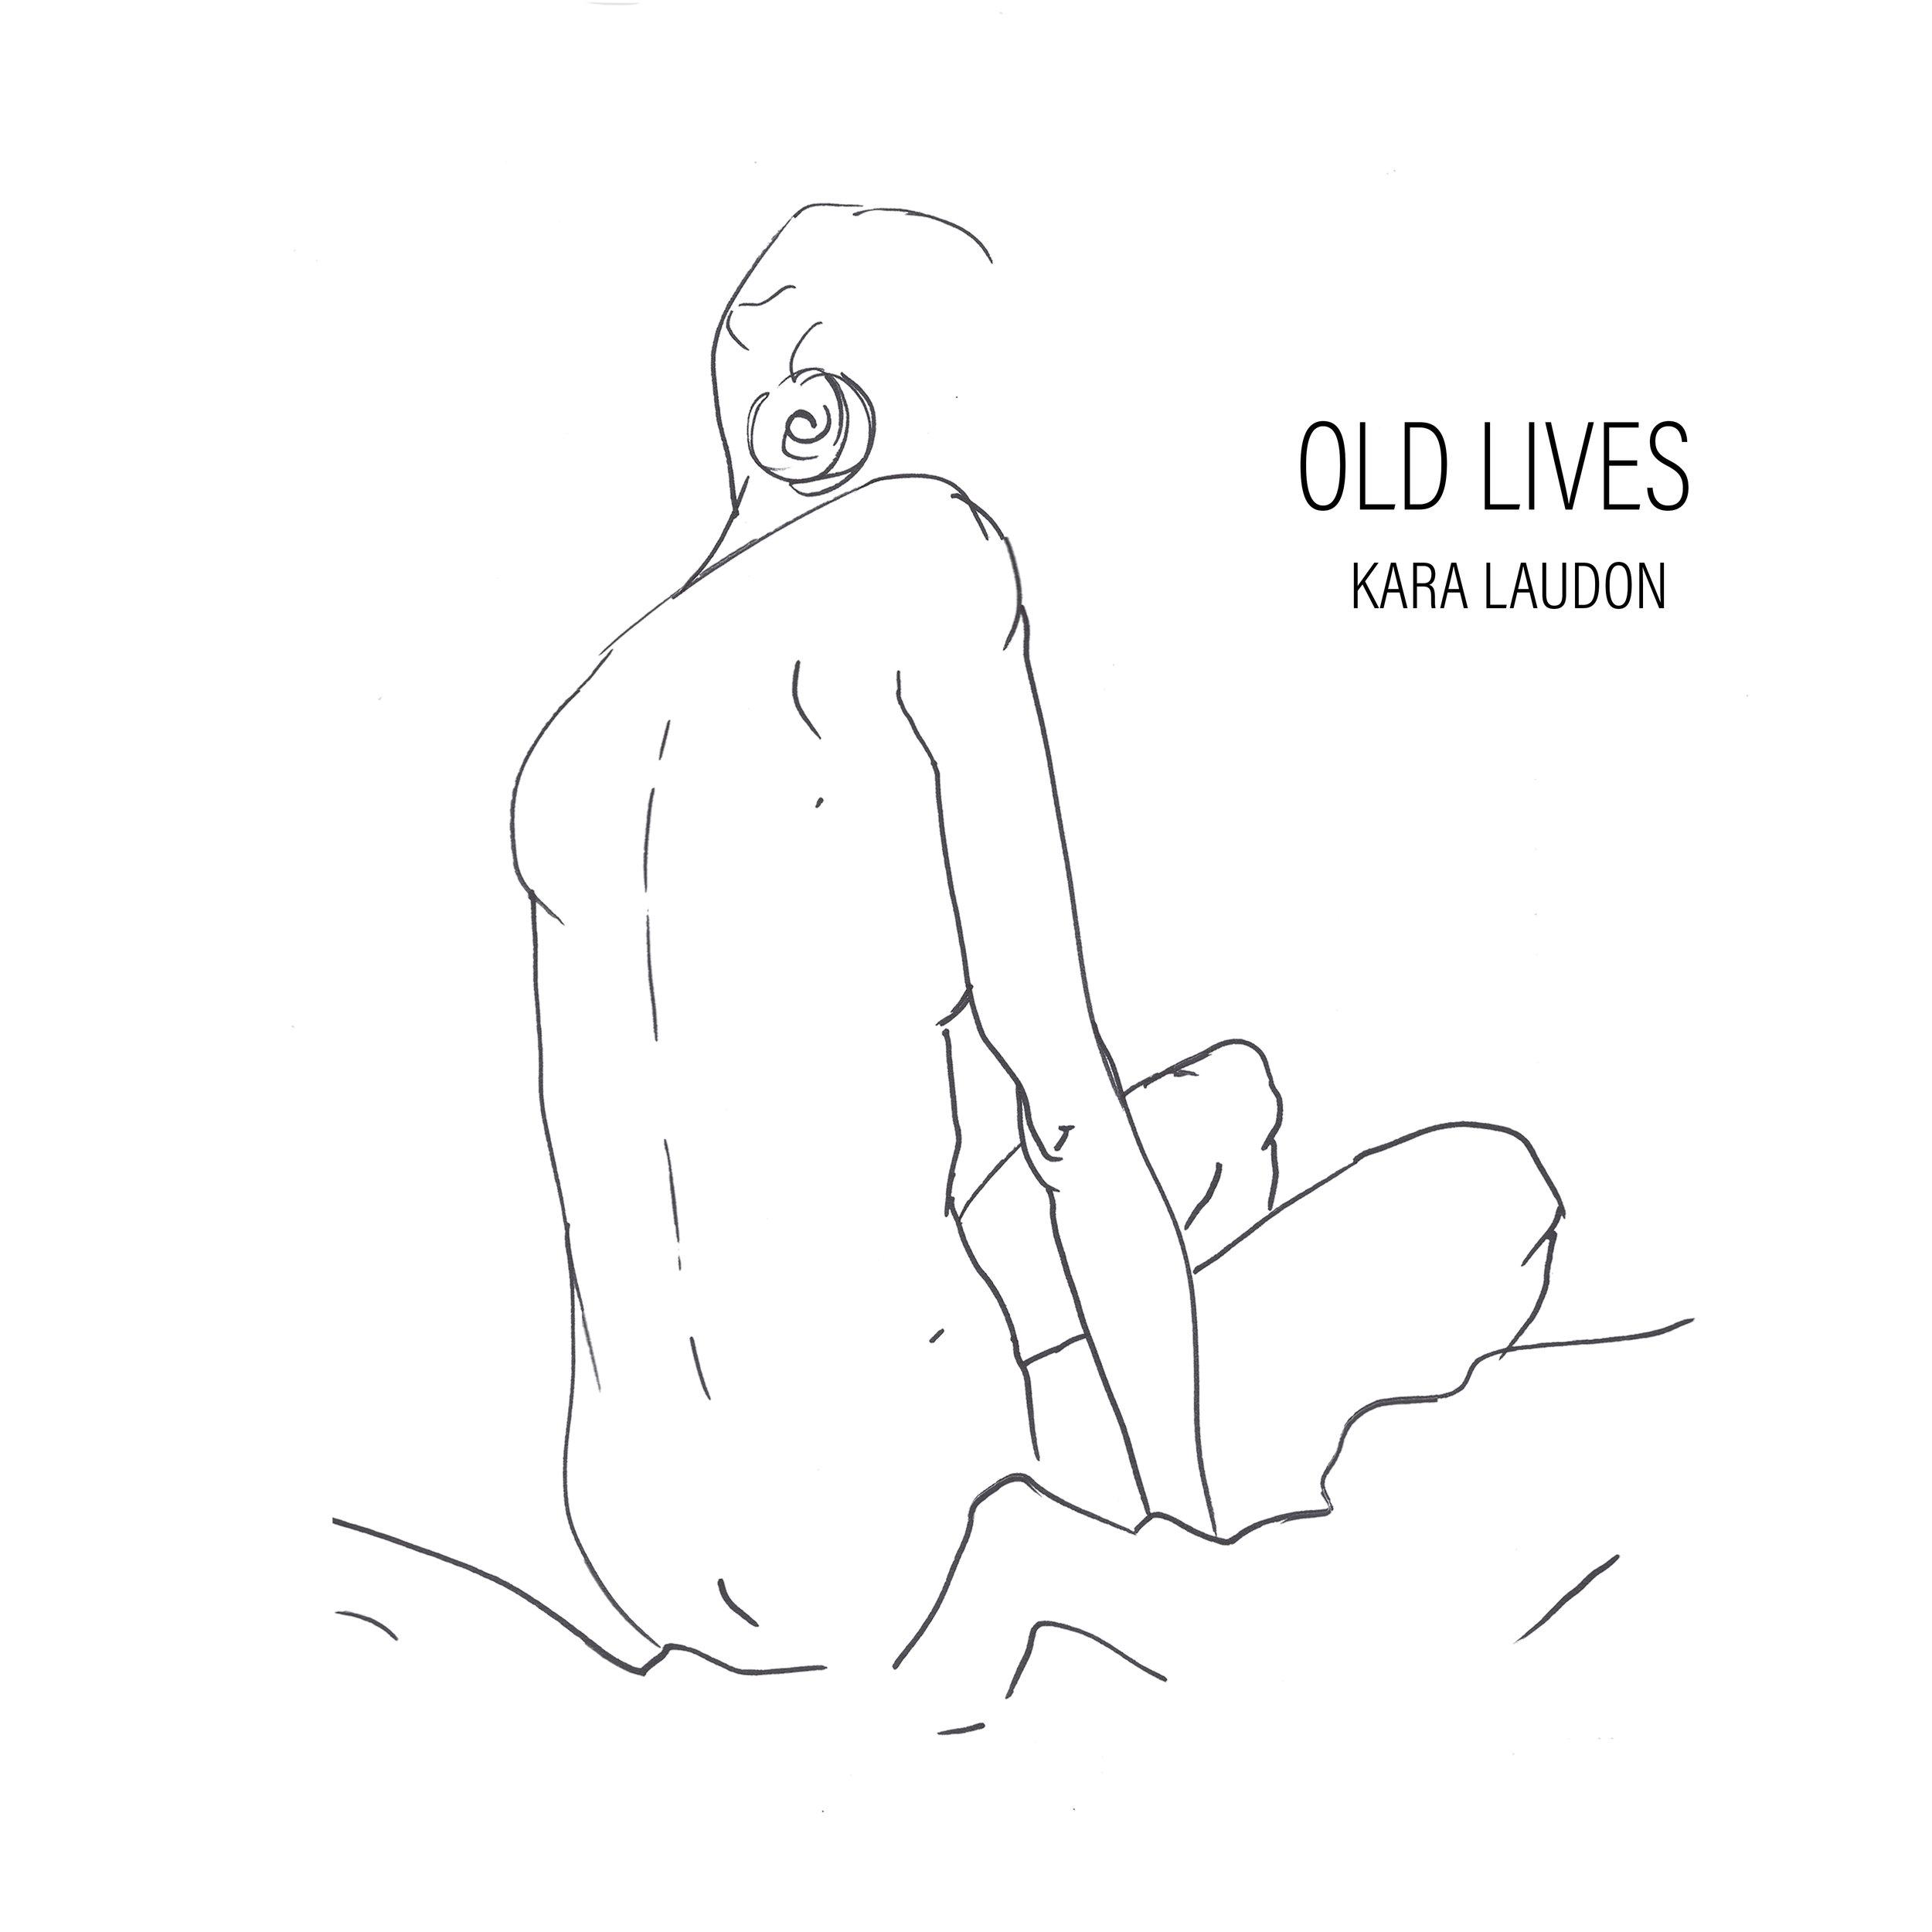 KARA LAUDON OLD LIVES - 2019 producer, engineer, performer